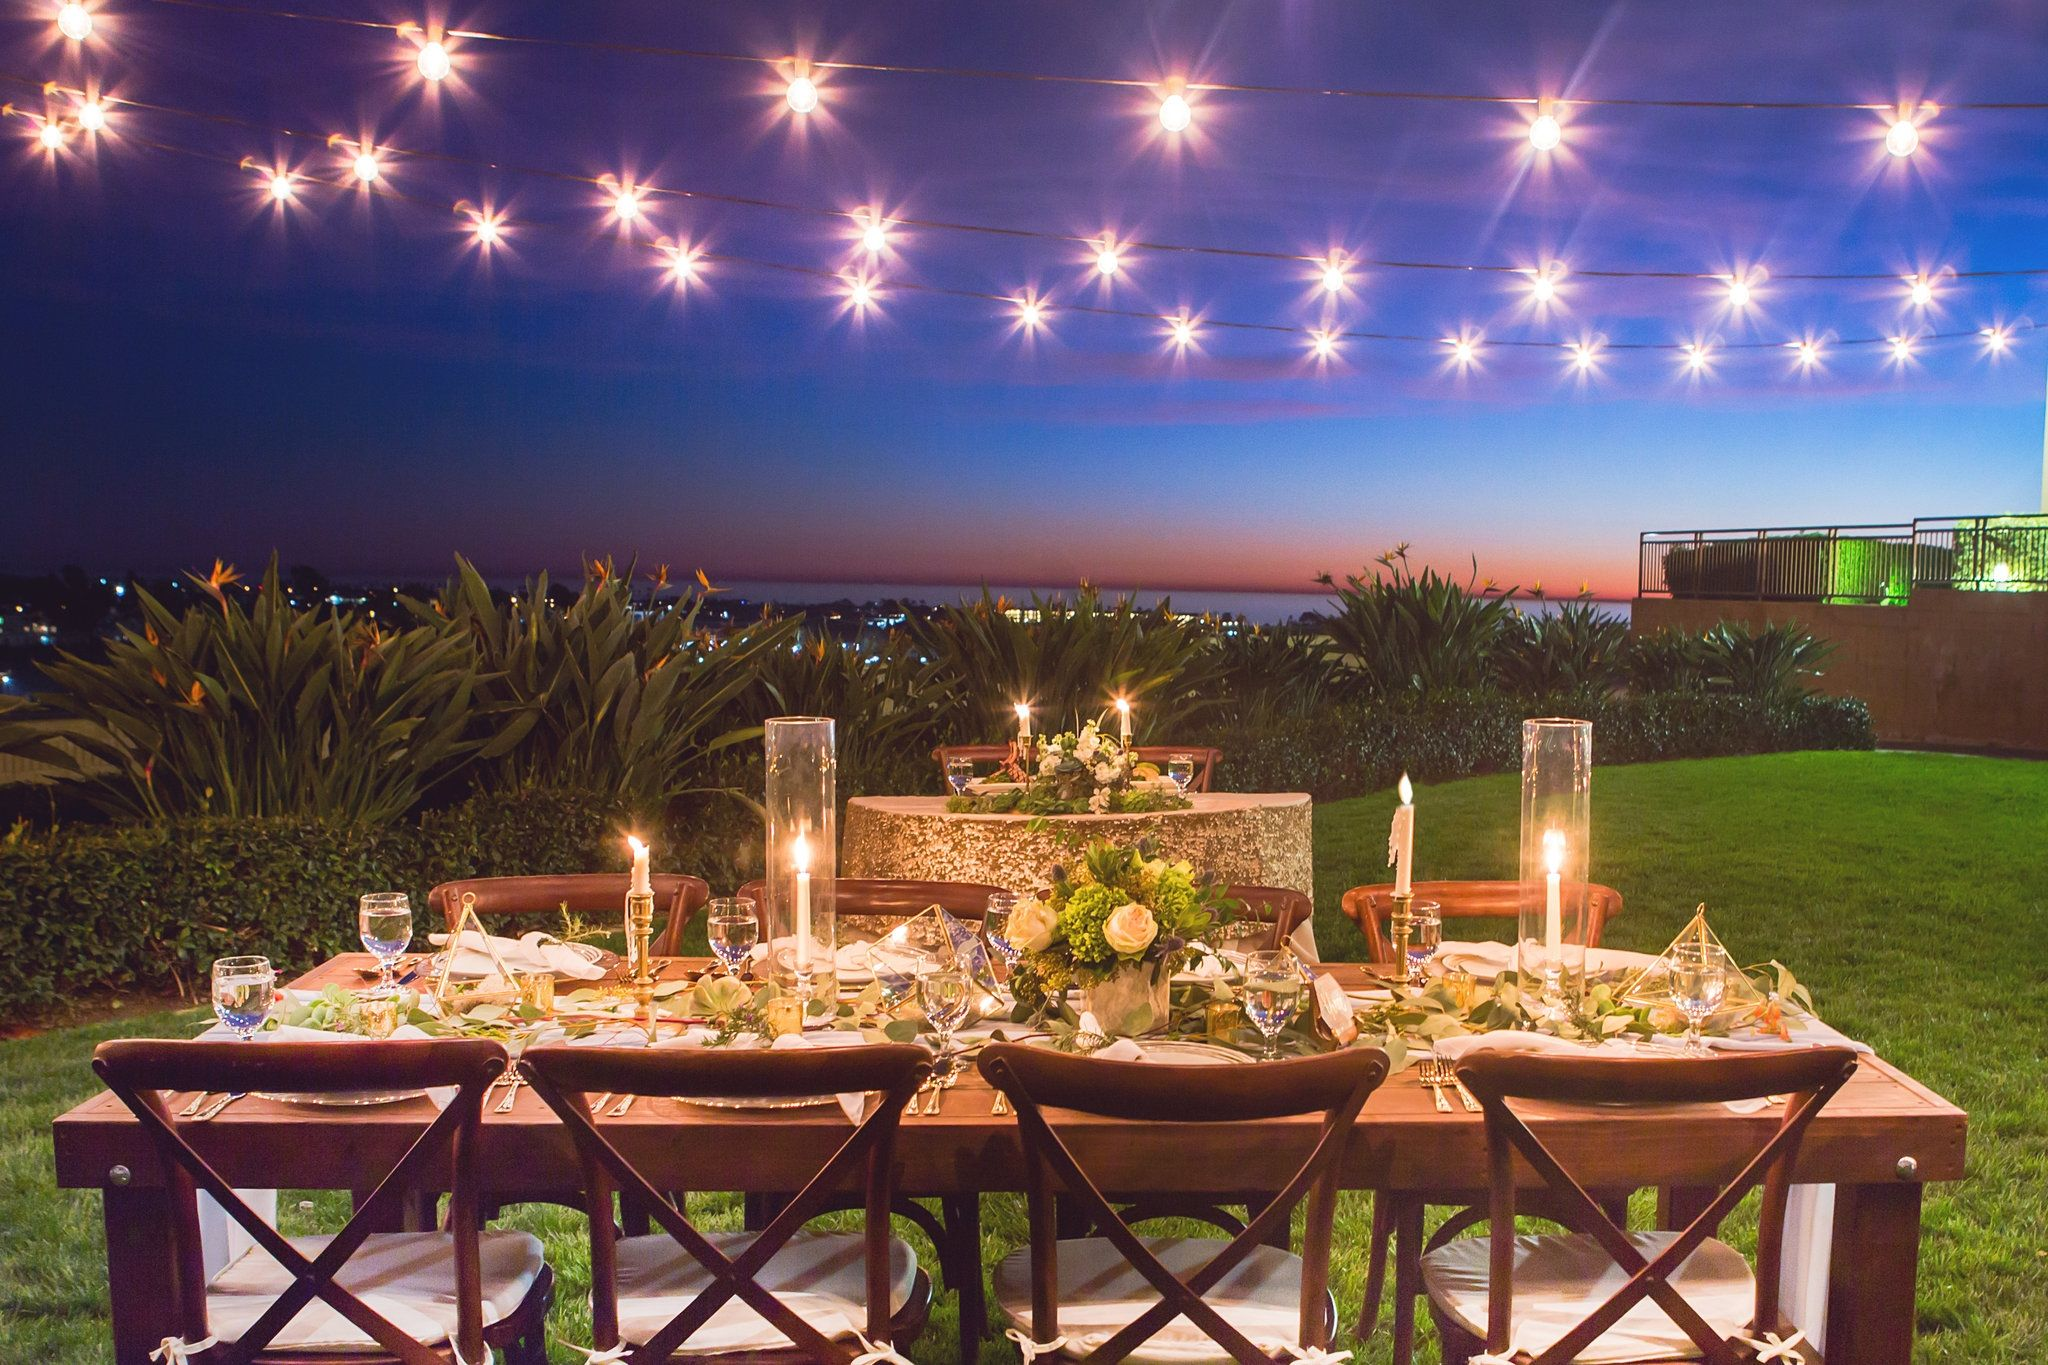 Grand pacific palisades resort hotel southern